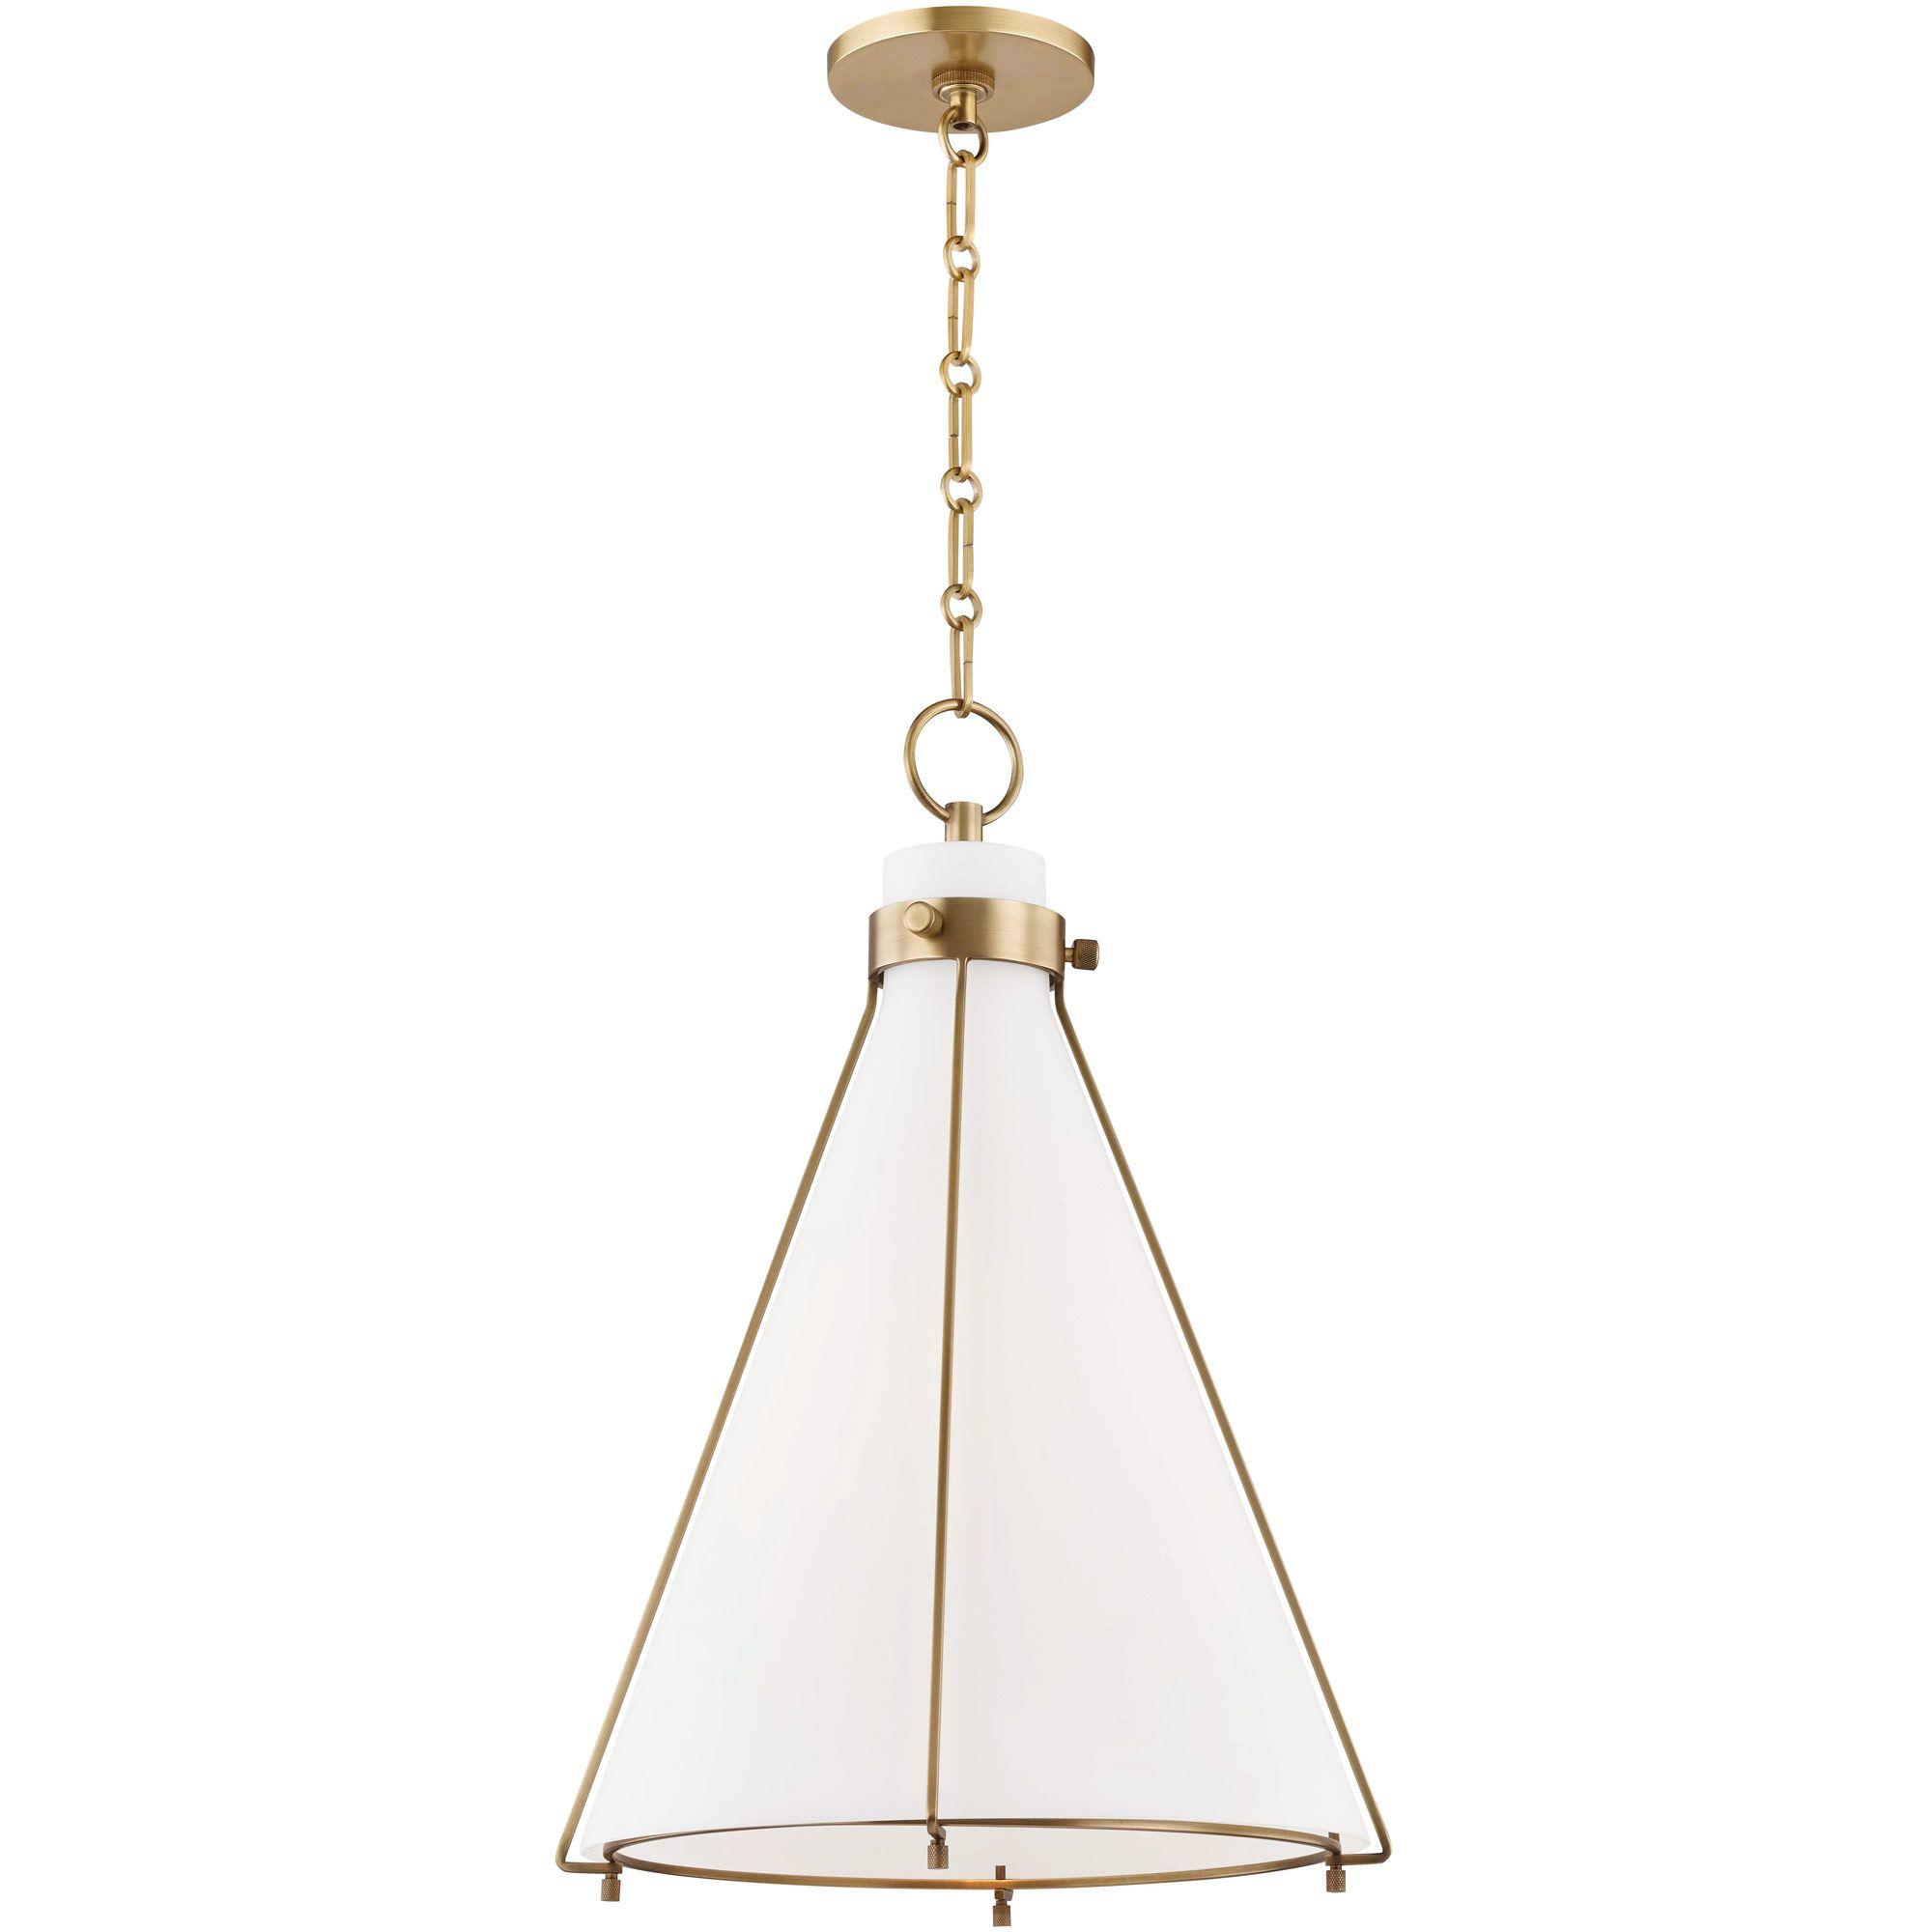 Eldridge Cone Pendant By Hudson Valley Lighting 7316 Ob In 2020 Cone Pendant Hudson Valley Lighting Ceiling Pendant Lights